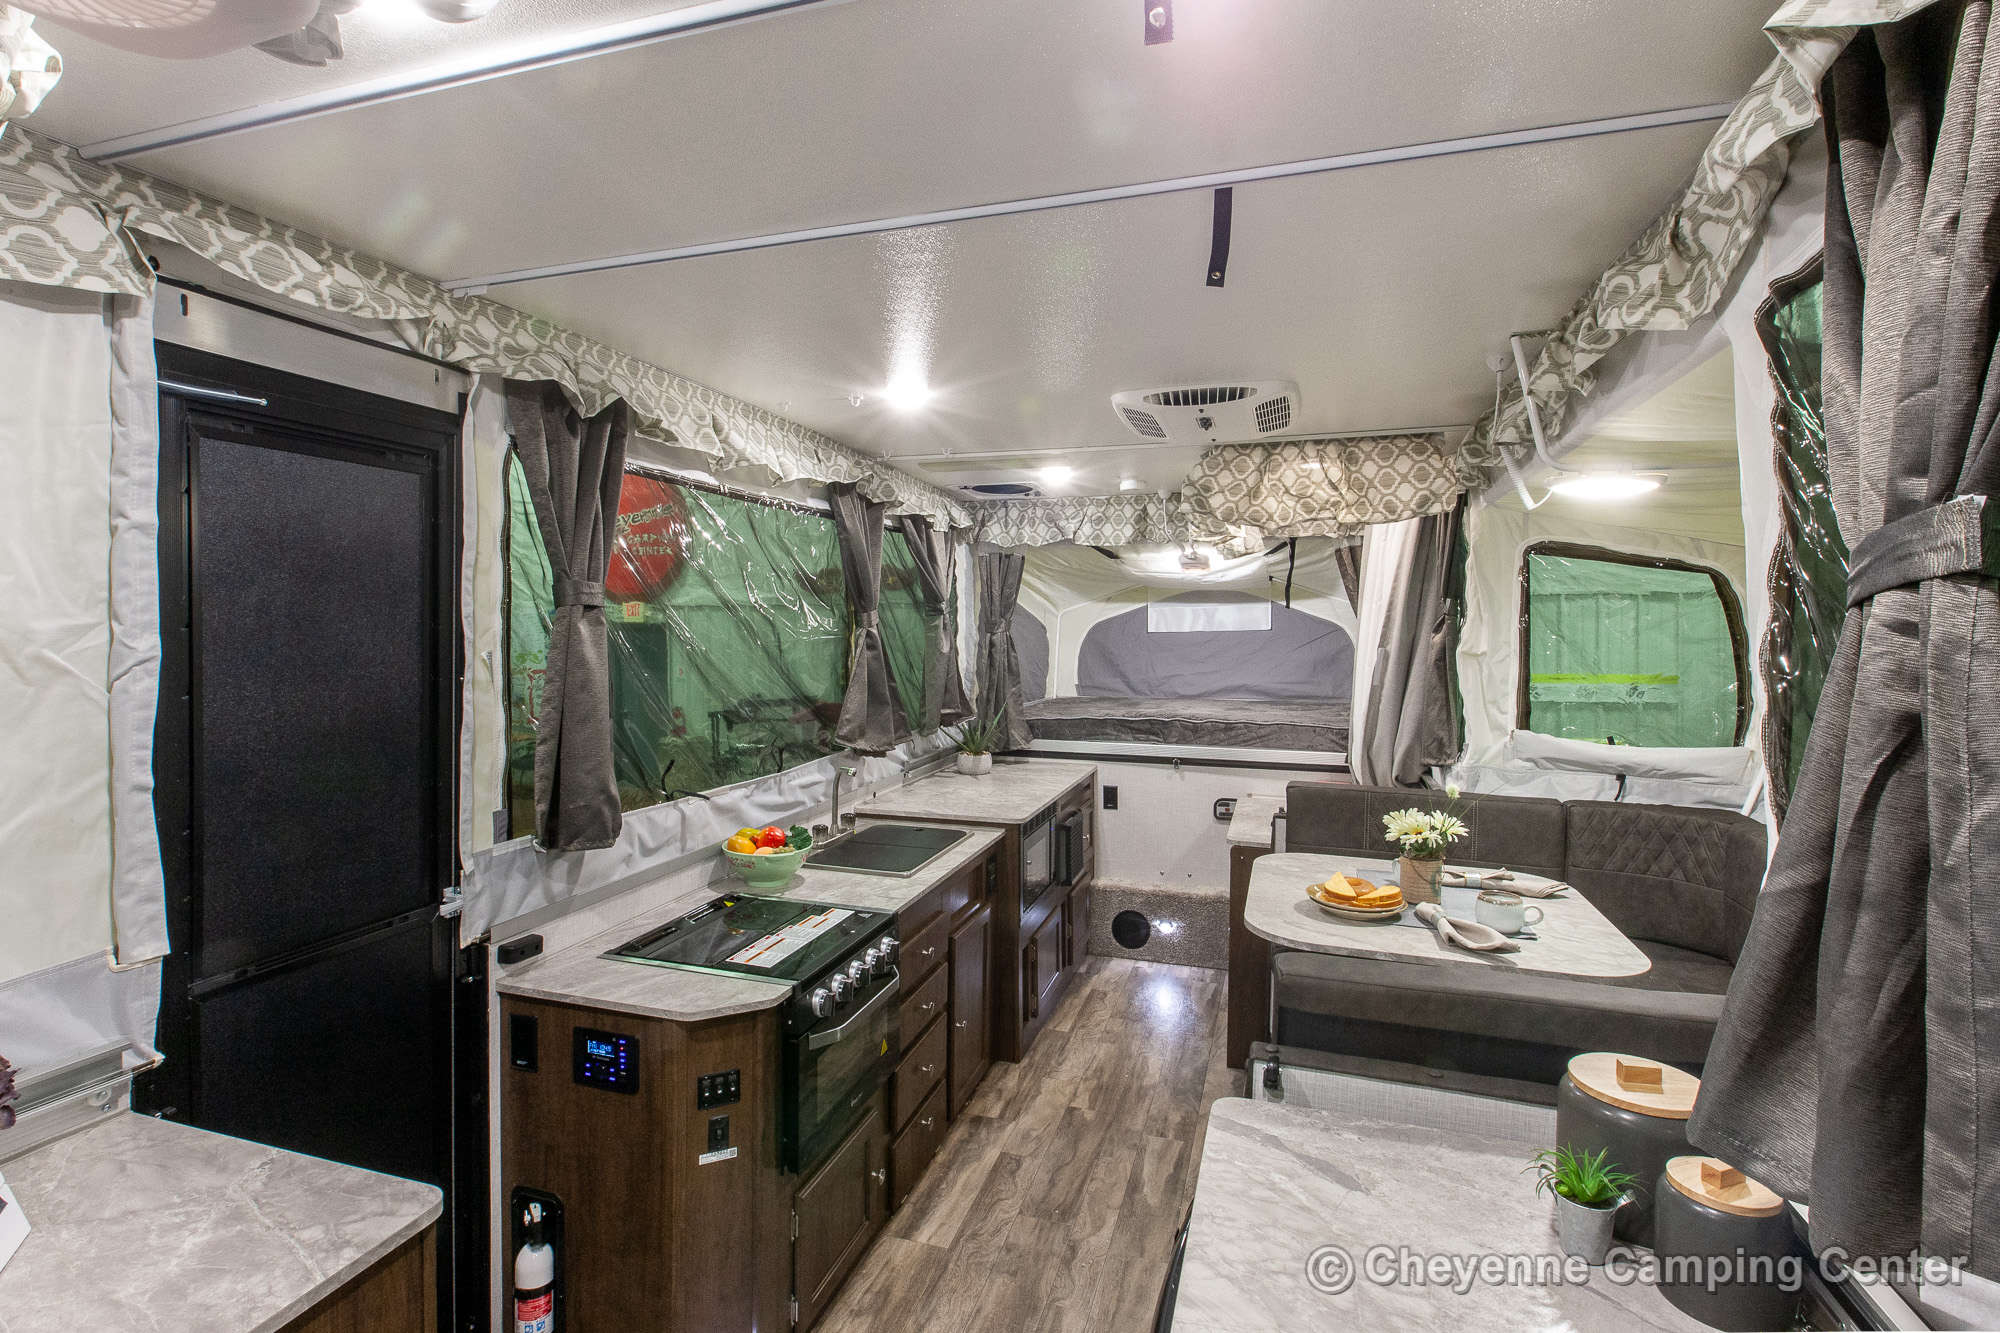 2021 Forest River Flagstaff High Wall HW27KS Folding Camper Interior Image